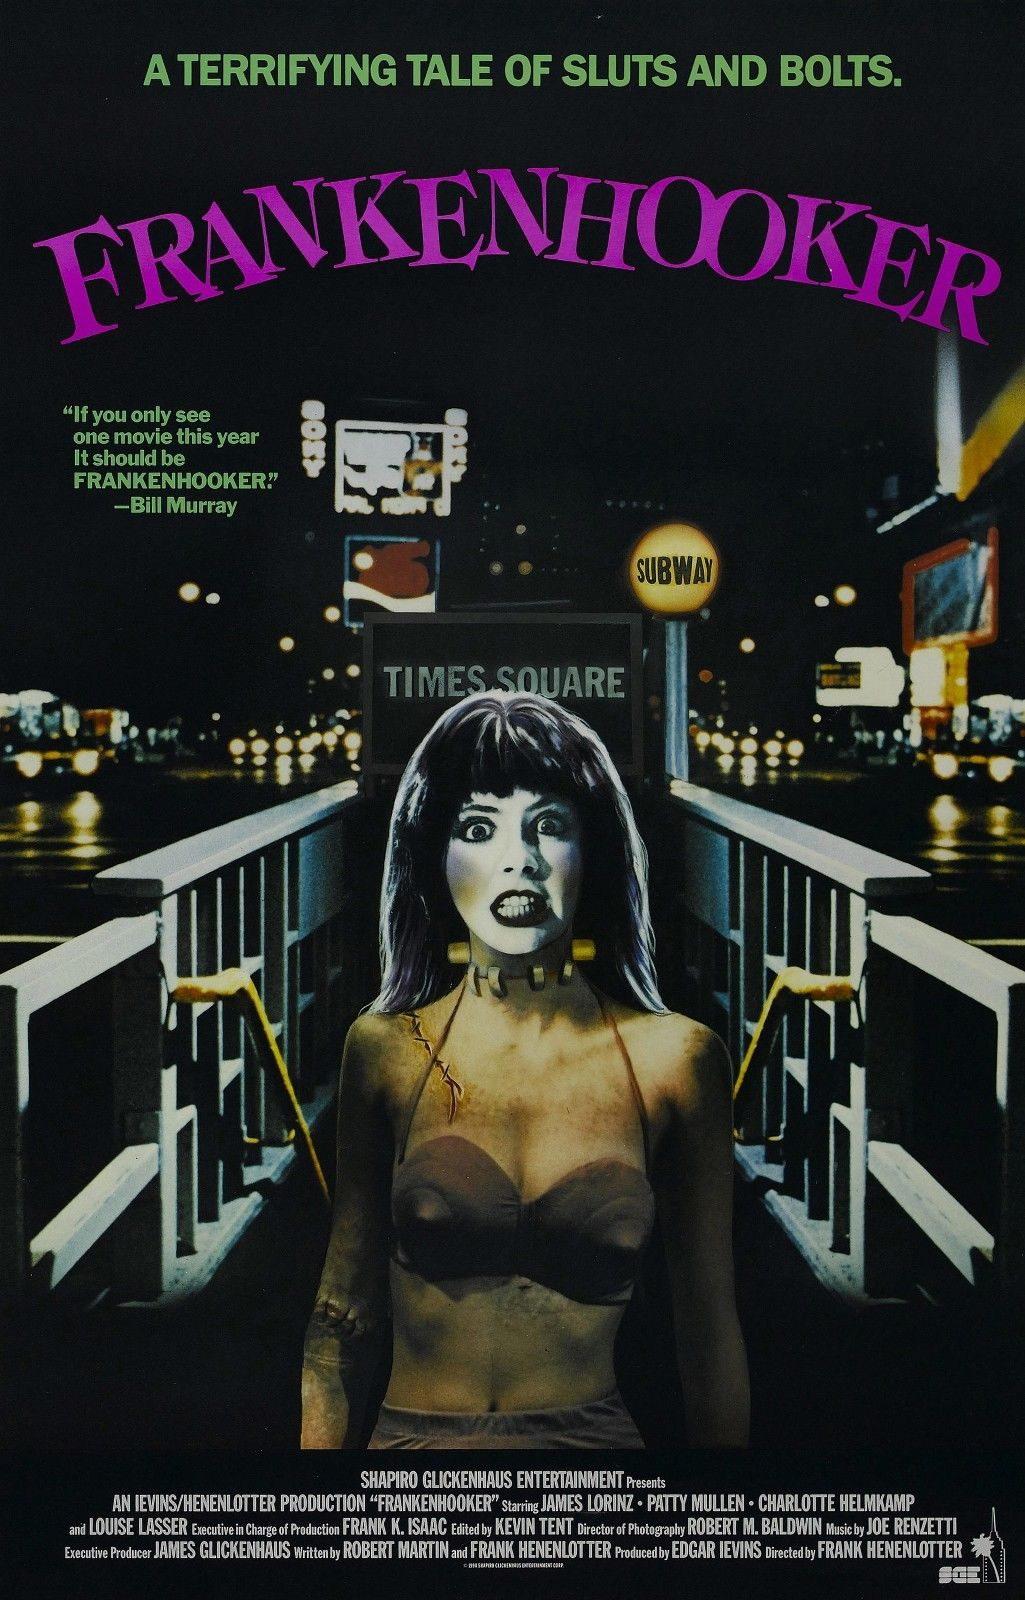 72392-FRANKENHOOKER-Movie-Horror-Wall-Print-Poster-Affiche